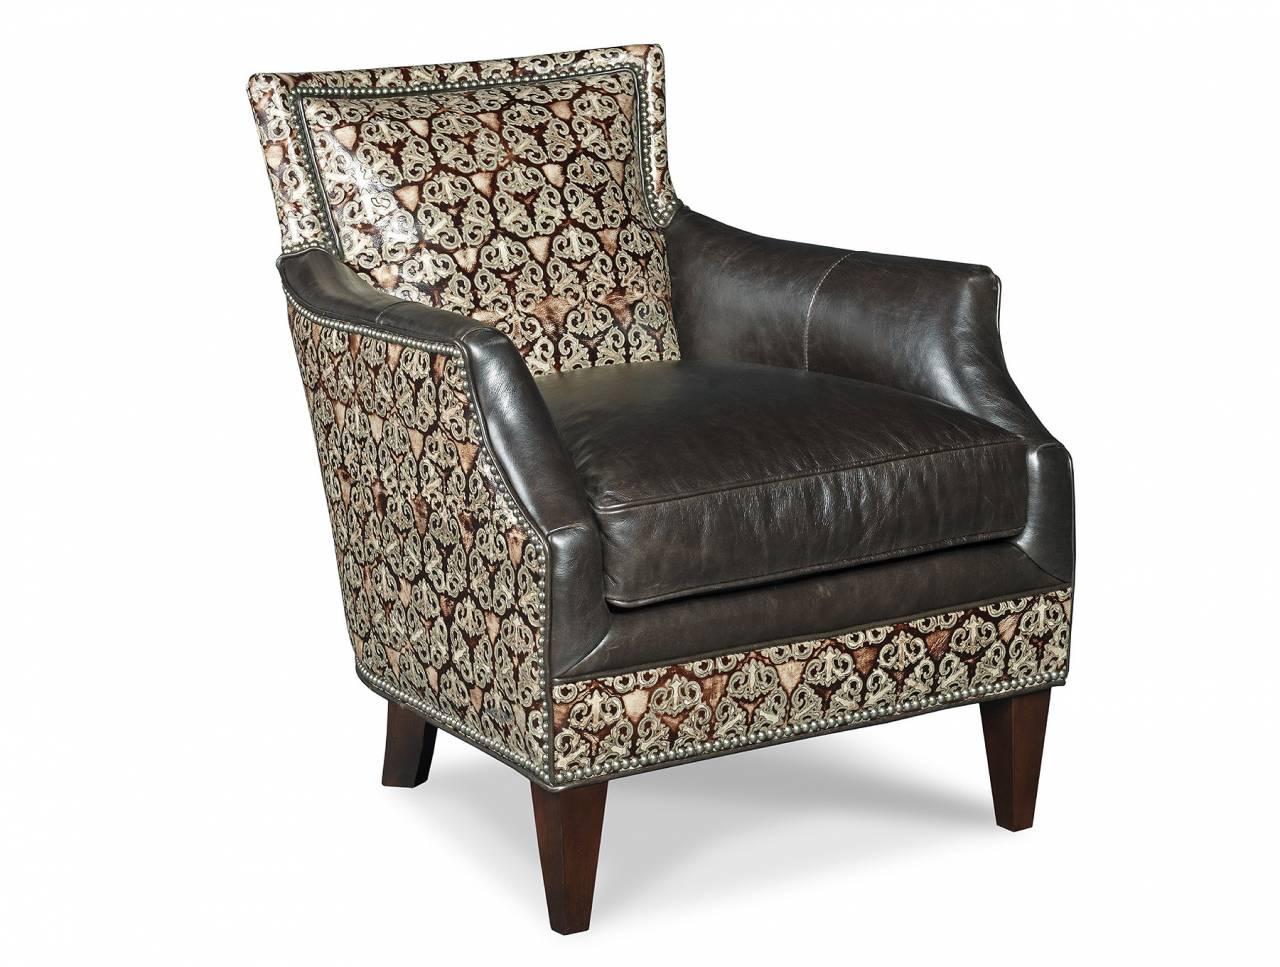 sofa and chairs bloomington mn grey corner sofas uk tandy chair of minnesota